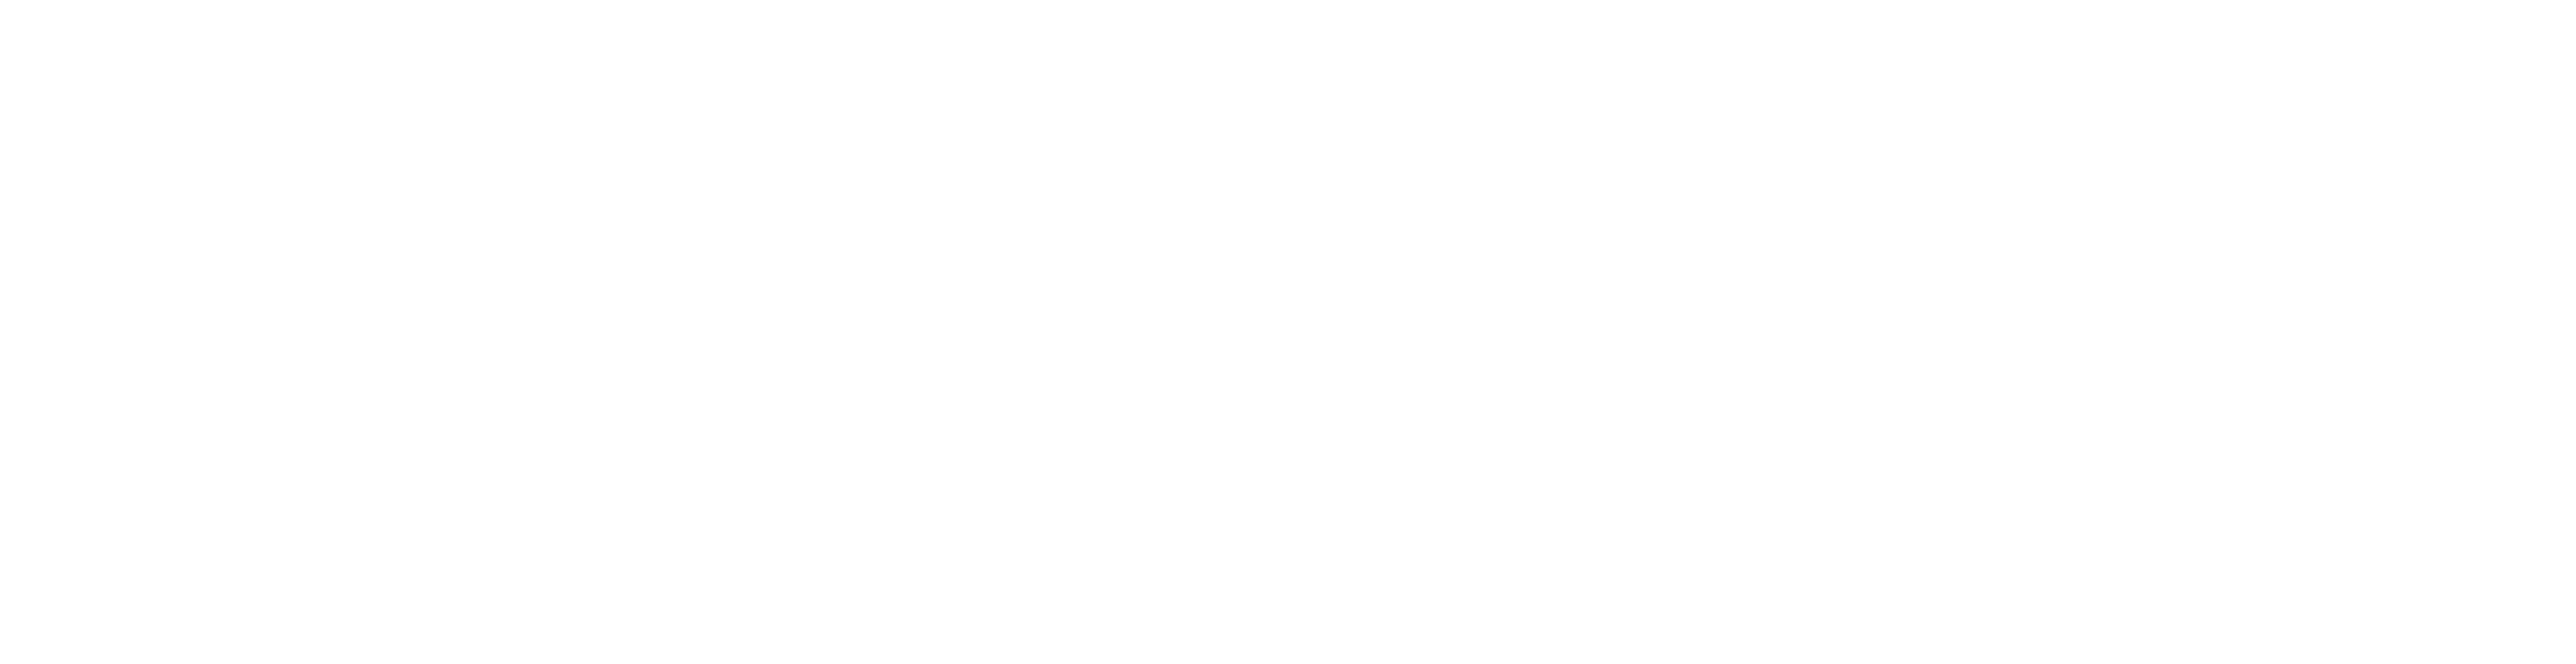 Team Rubicon Disaster Response